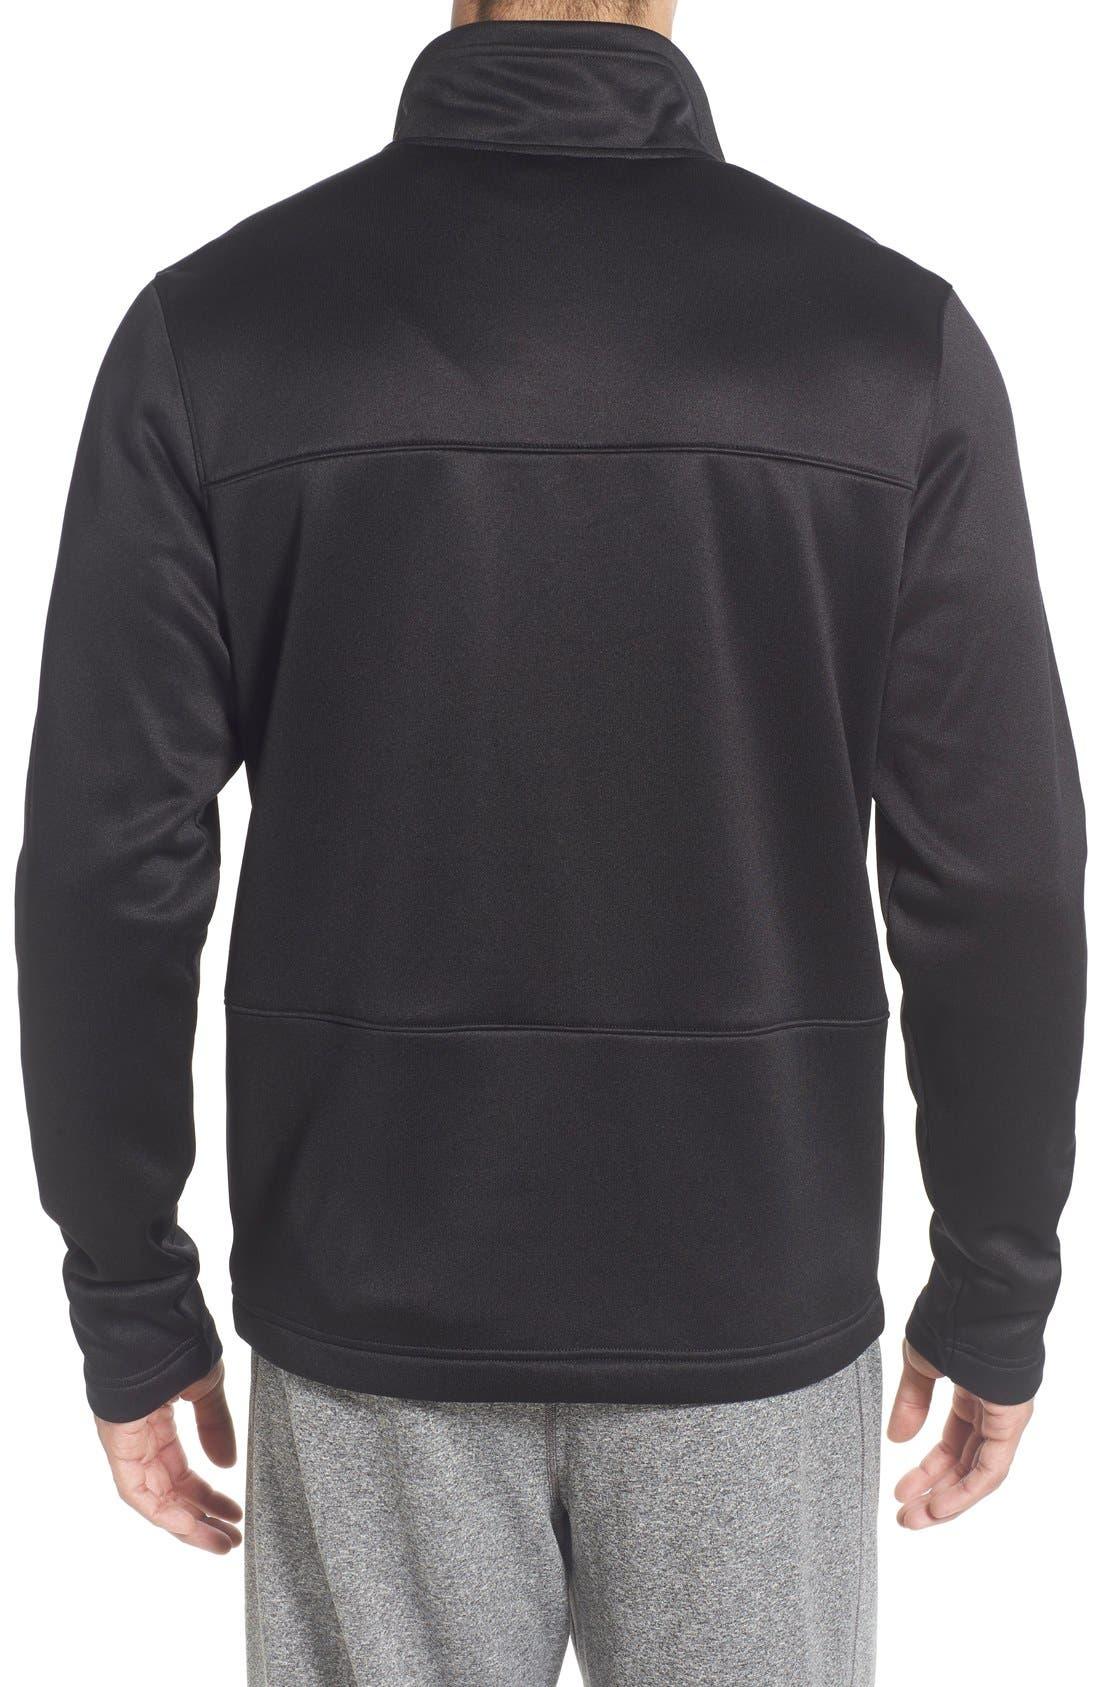 'Momentum' Fleece Jacket,                             Alternate thumbnail 2, color,                             Tnf Black